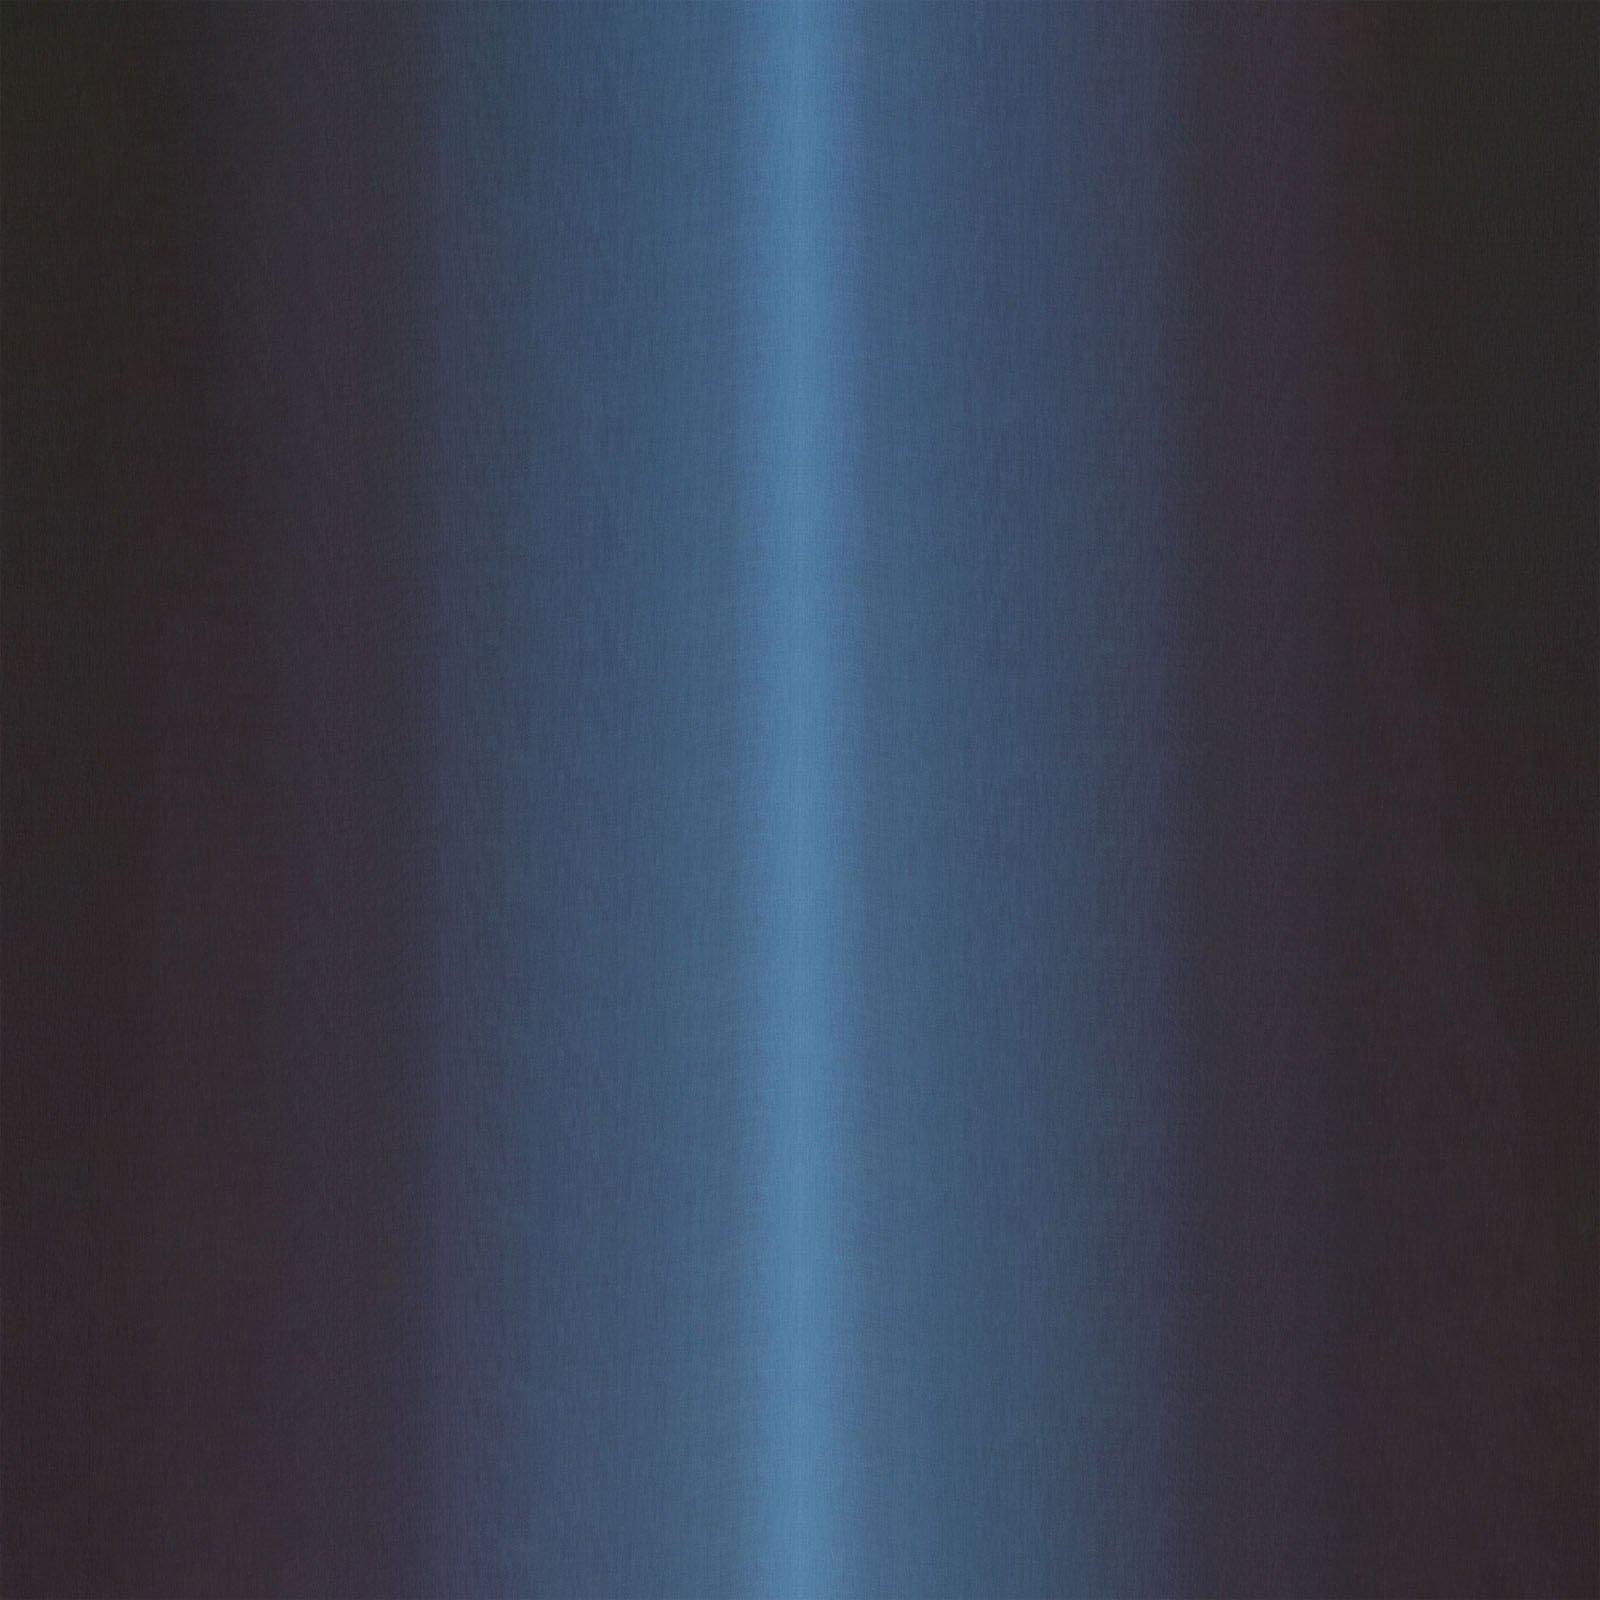 EESC-11216 NB - GELATO OMBRE BY MAYWOOD INDIGO BLUE TONAL